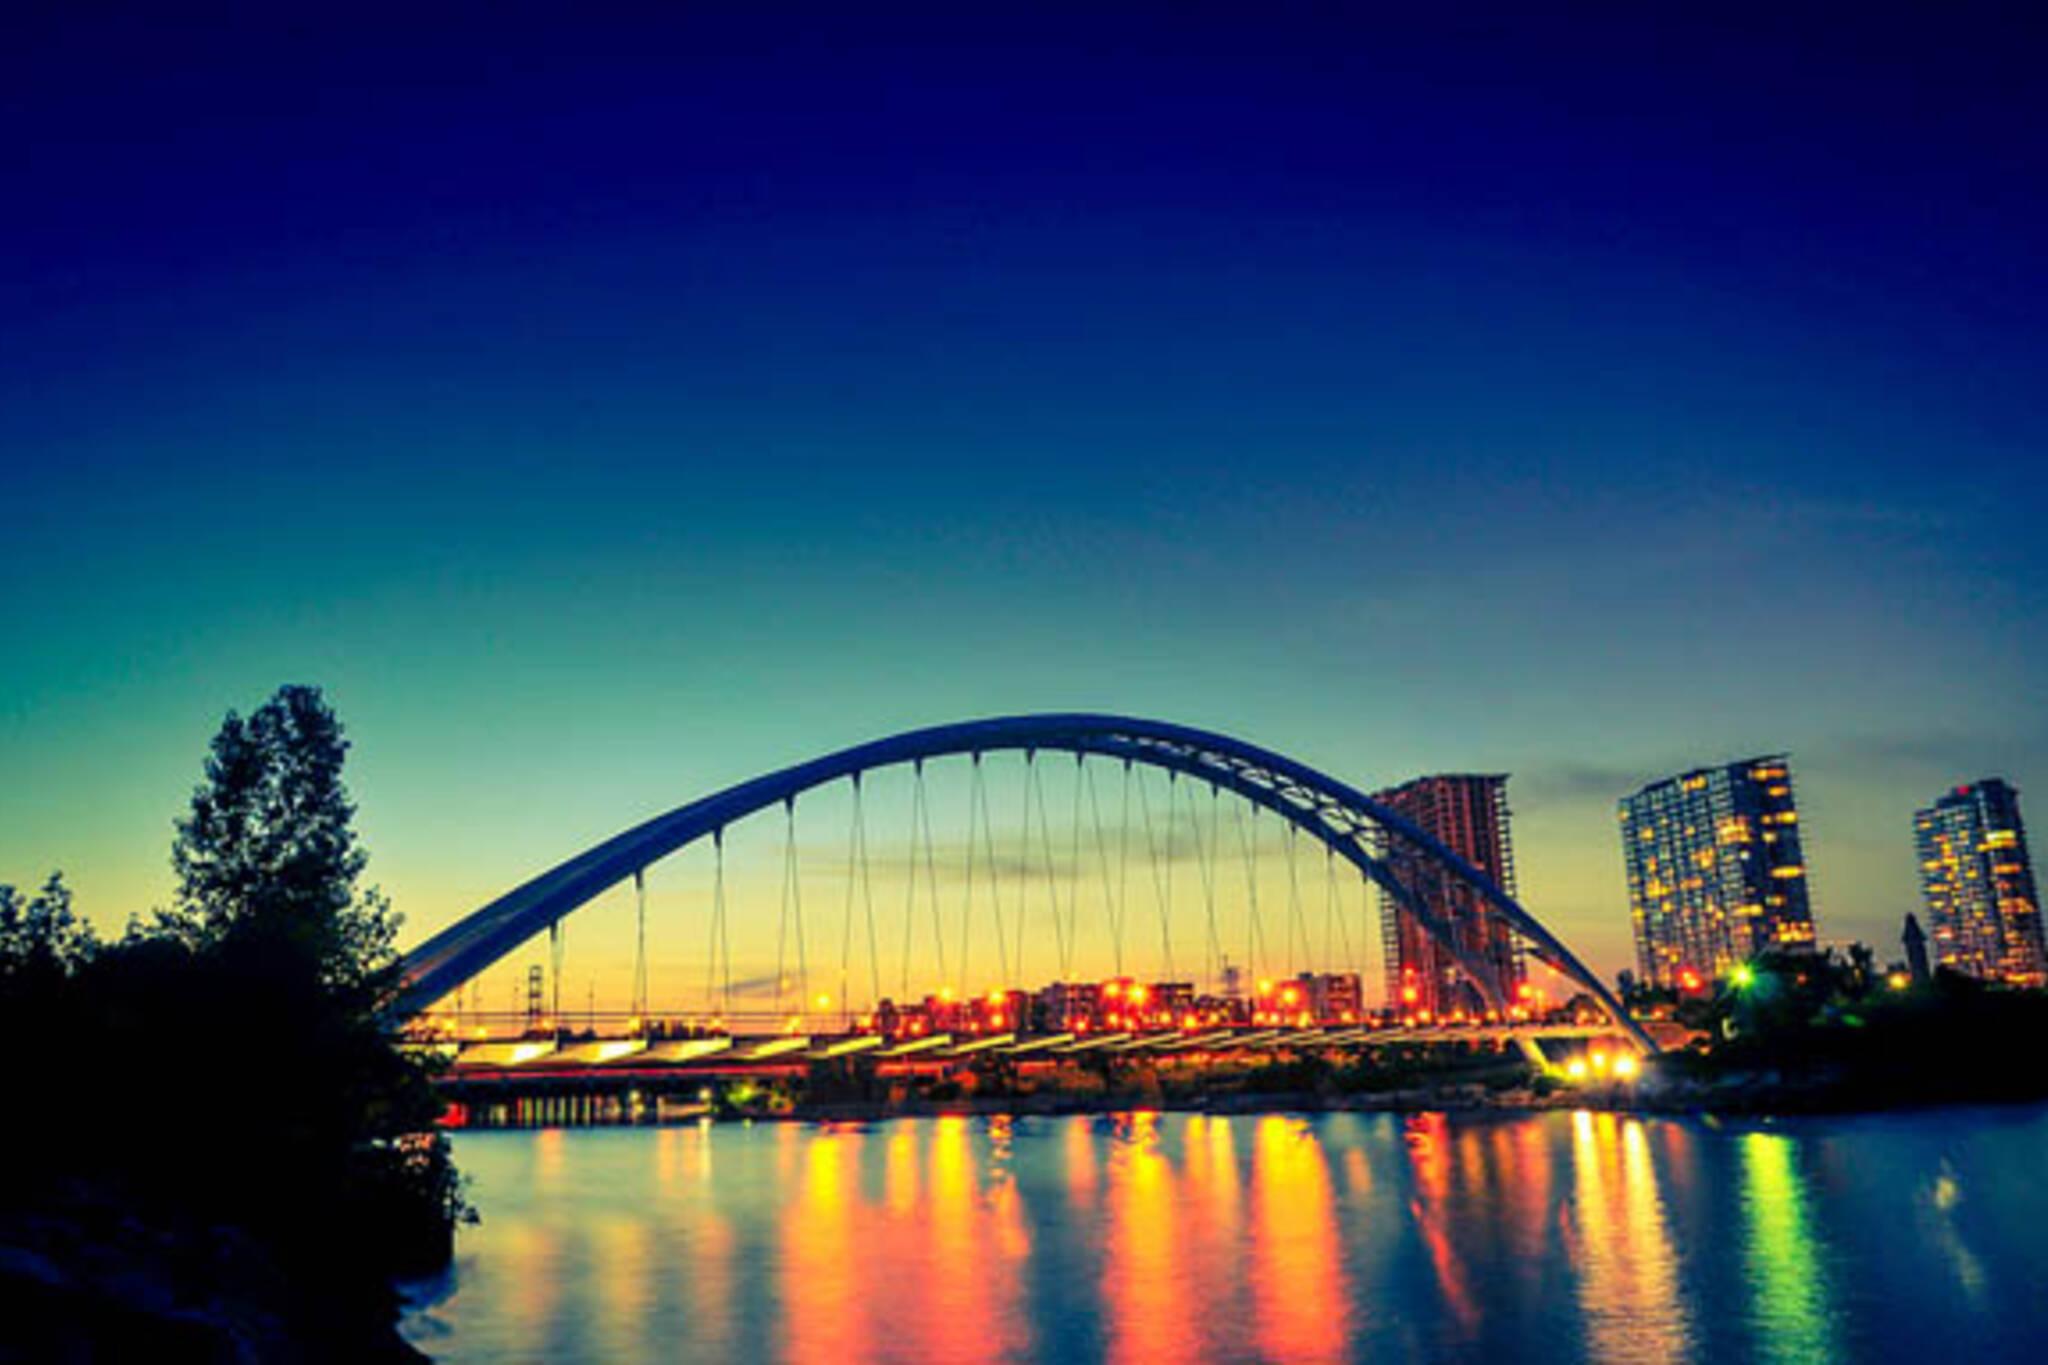 toronto humber bridge sunrise sunset